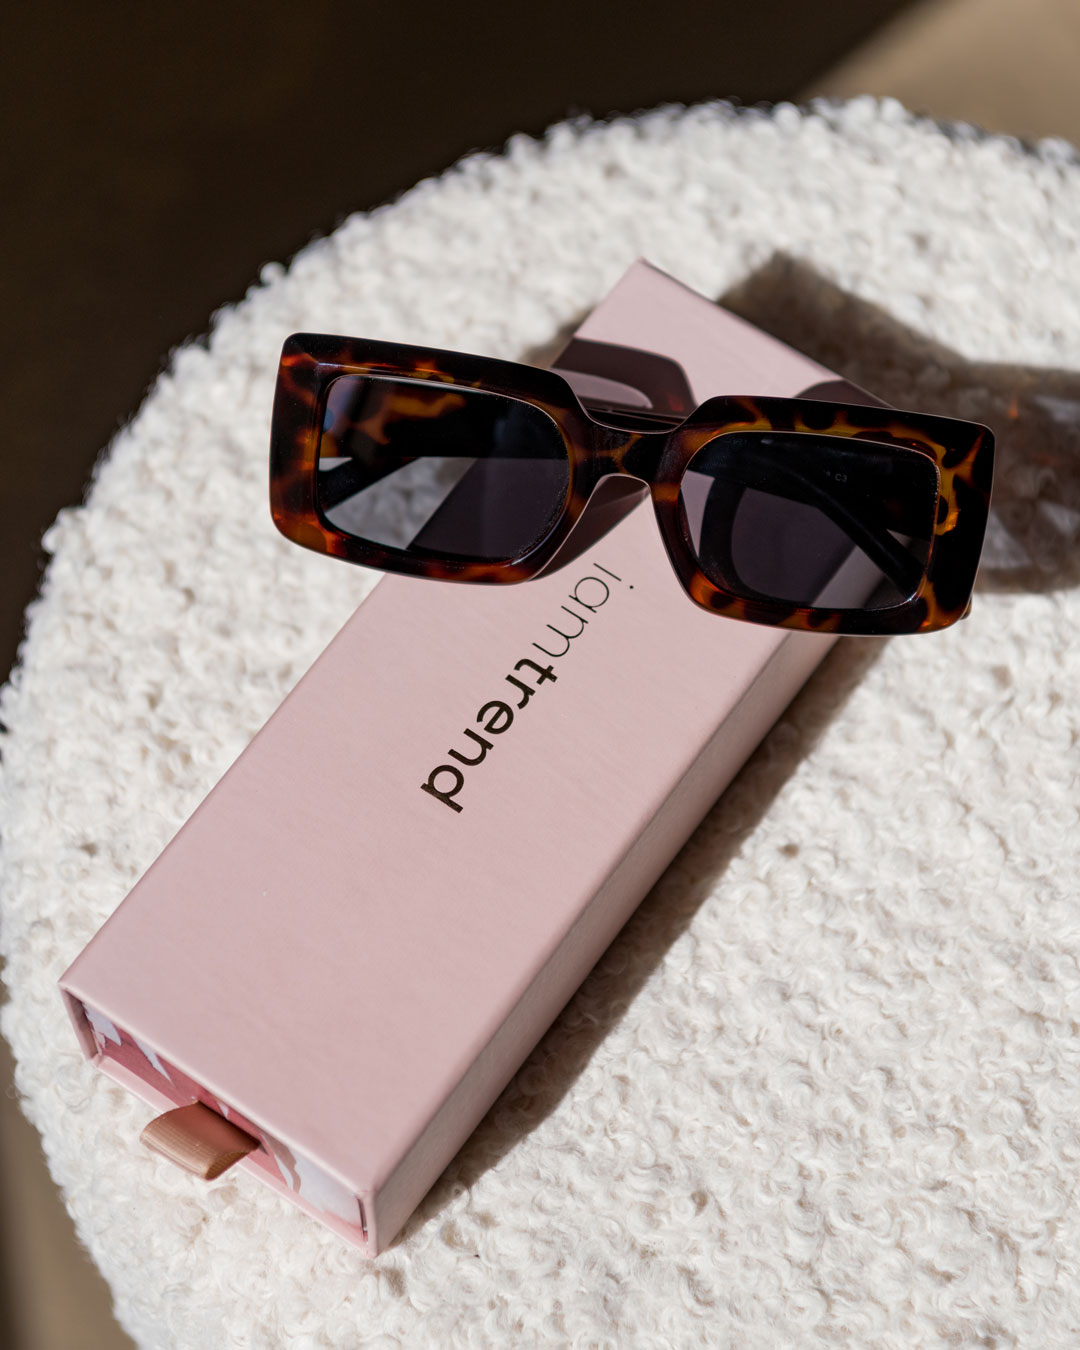 tortoise shell sunglasses on a pink box